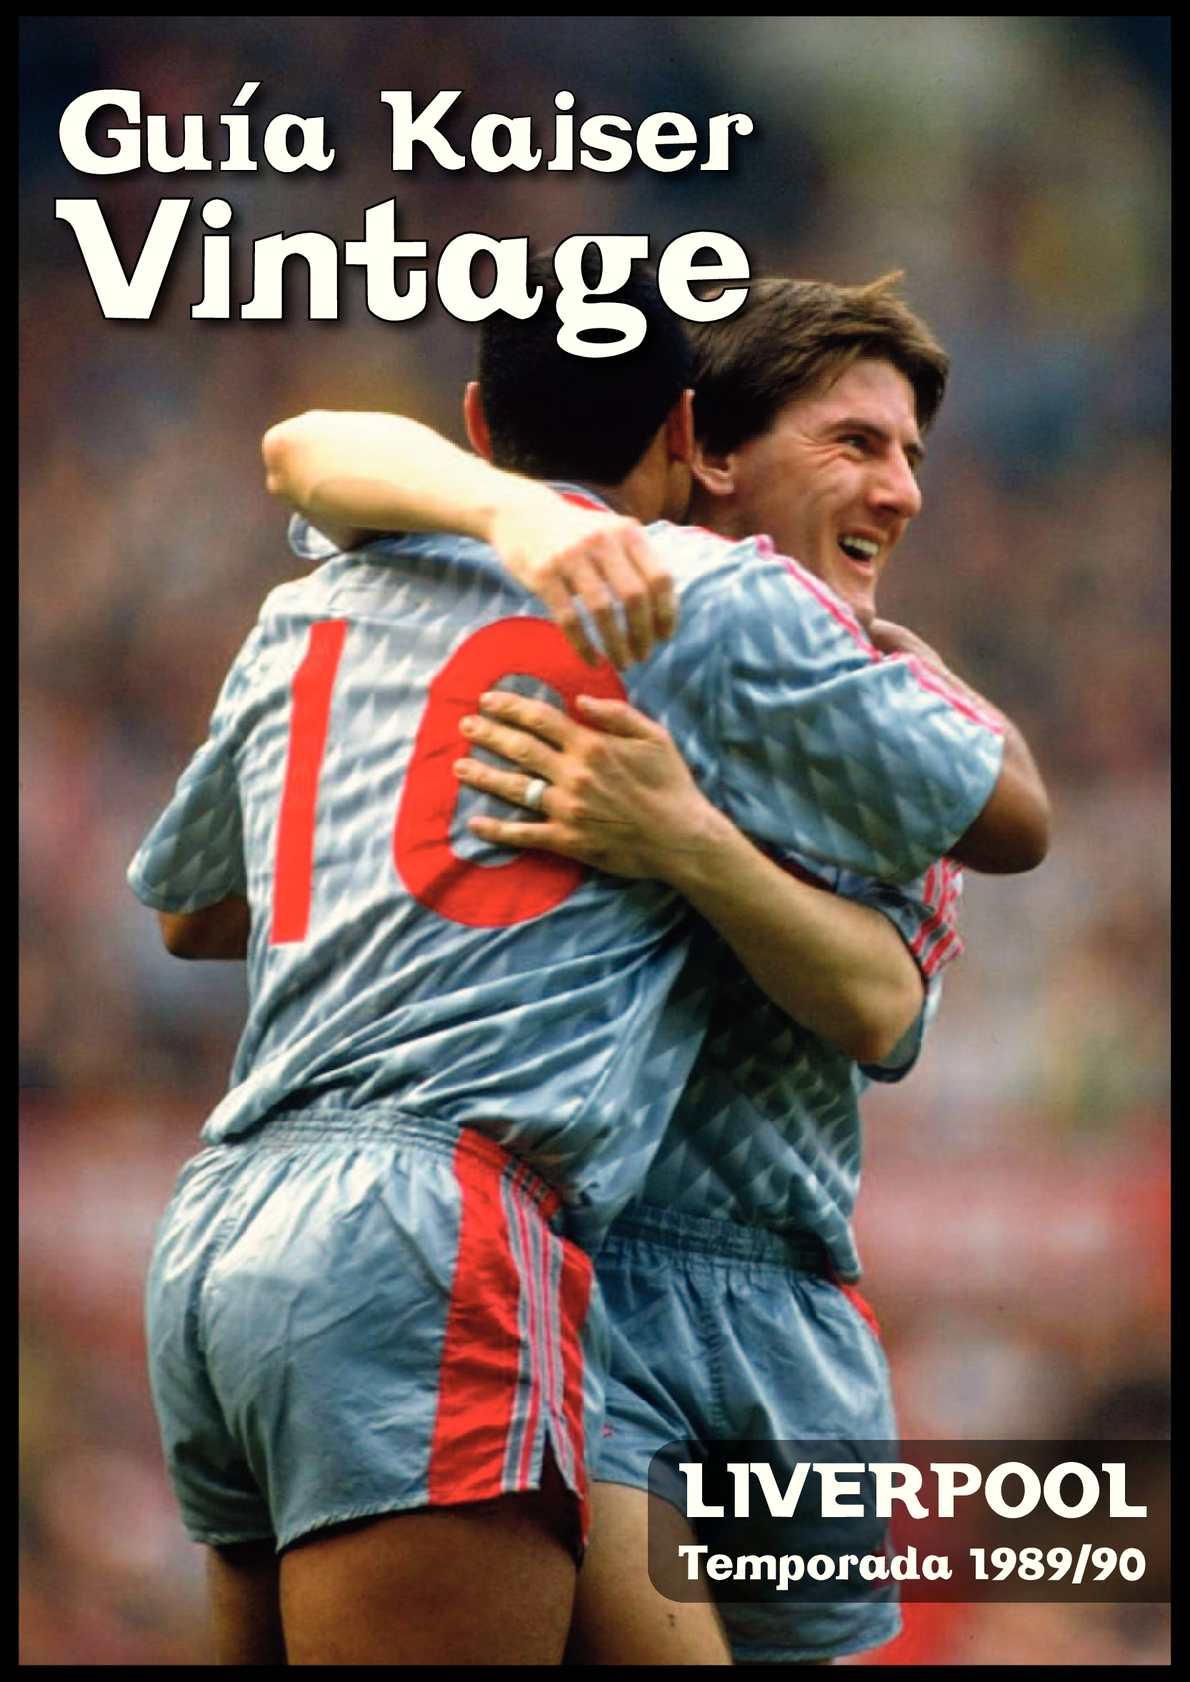 Revista The Kaiser Vintage Nº 30 Liverpool 1989/90